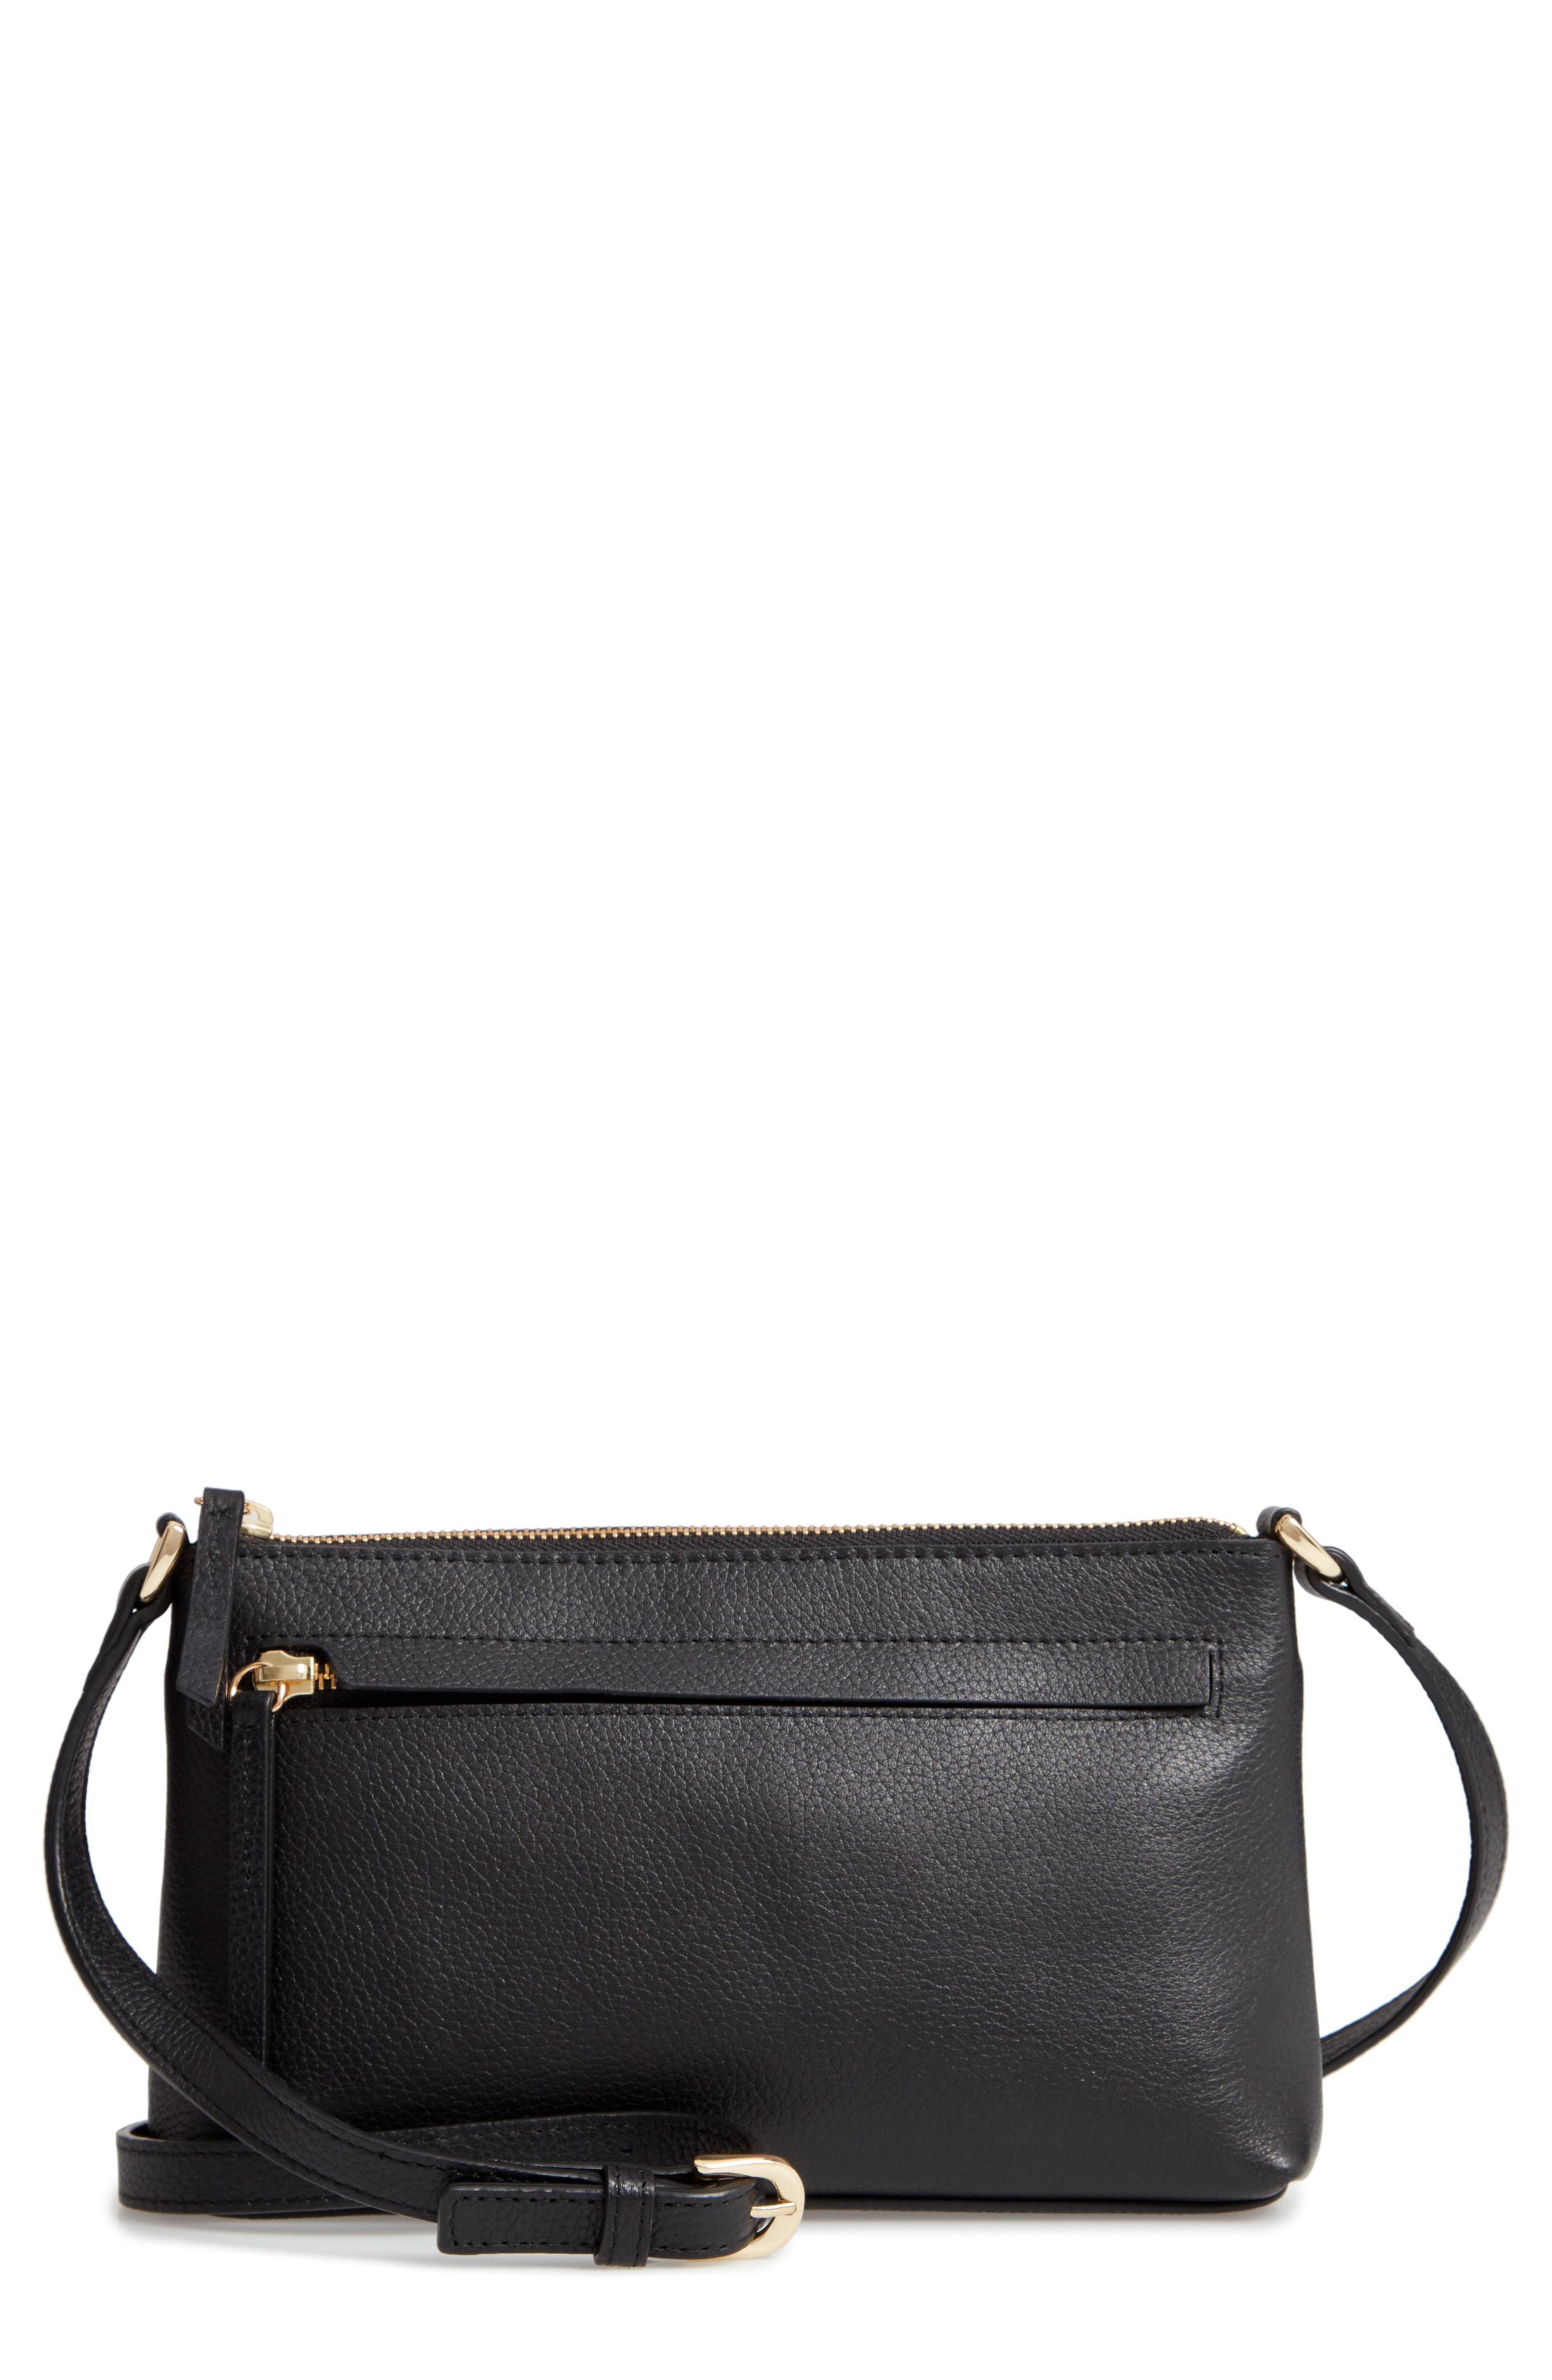 9b9825b51485 Nordstrom Mya Leather Crossbody Bag in Black - Save 40.0% - Lyst